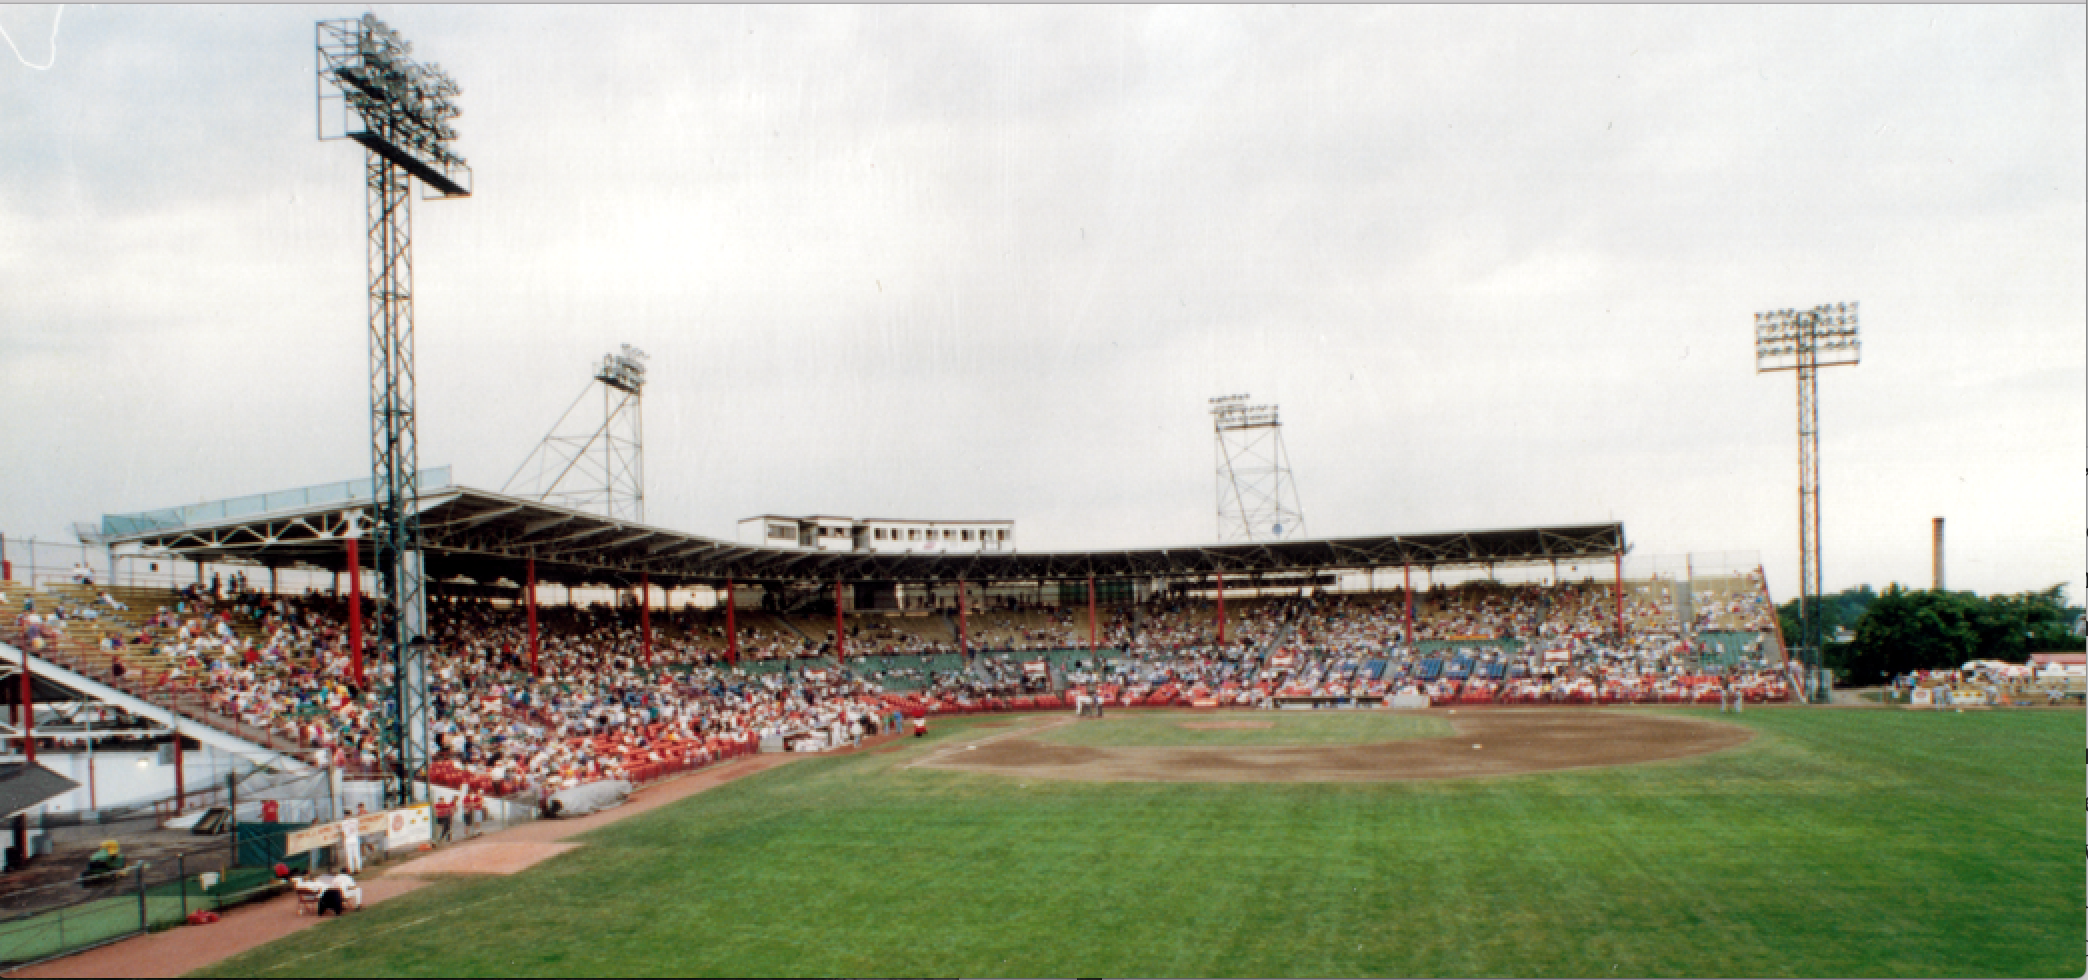 The Red Wings, Nietopski and Chamberlain: Rochester baseball history through the MLB Draft